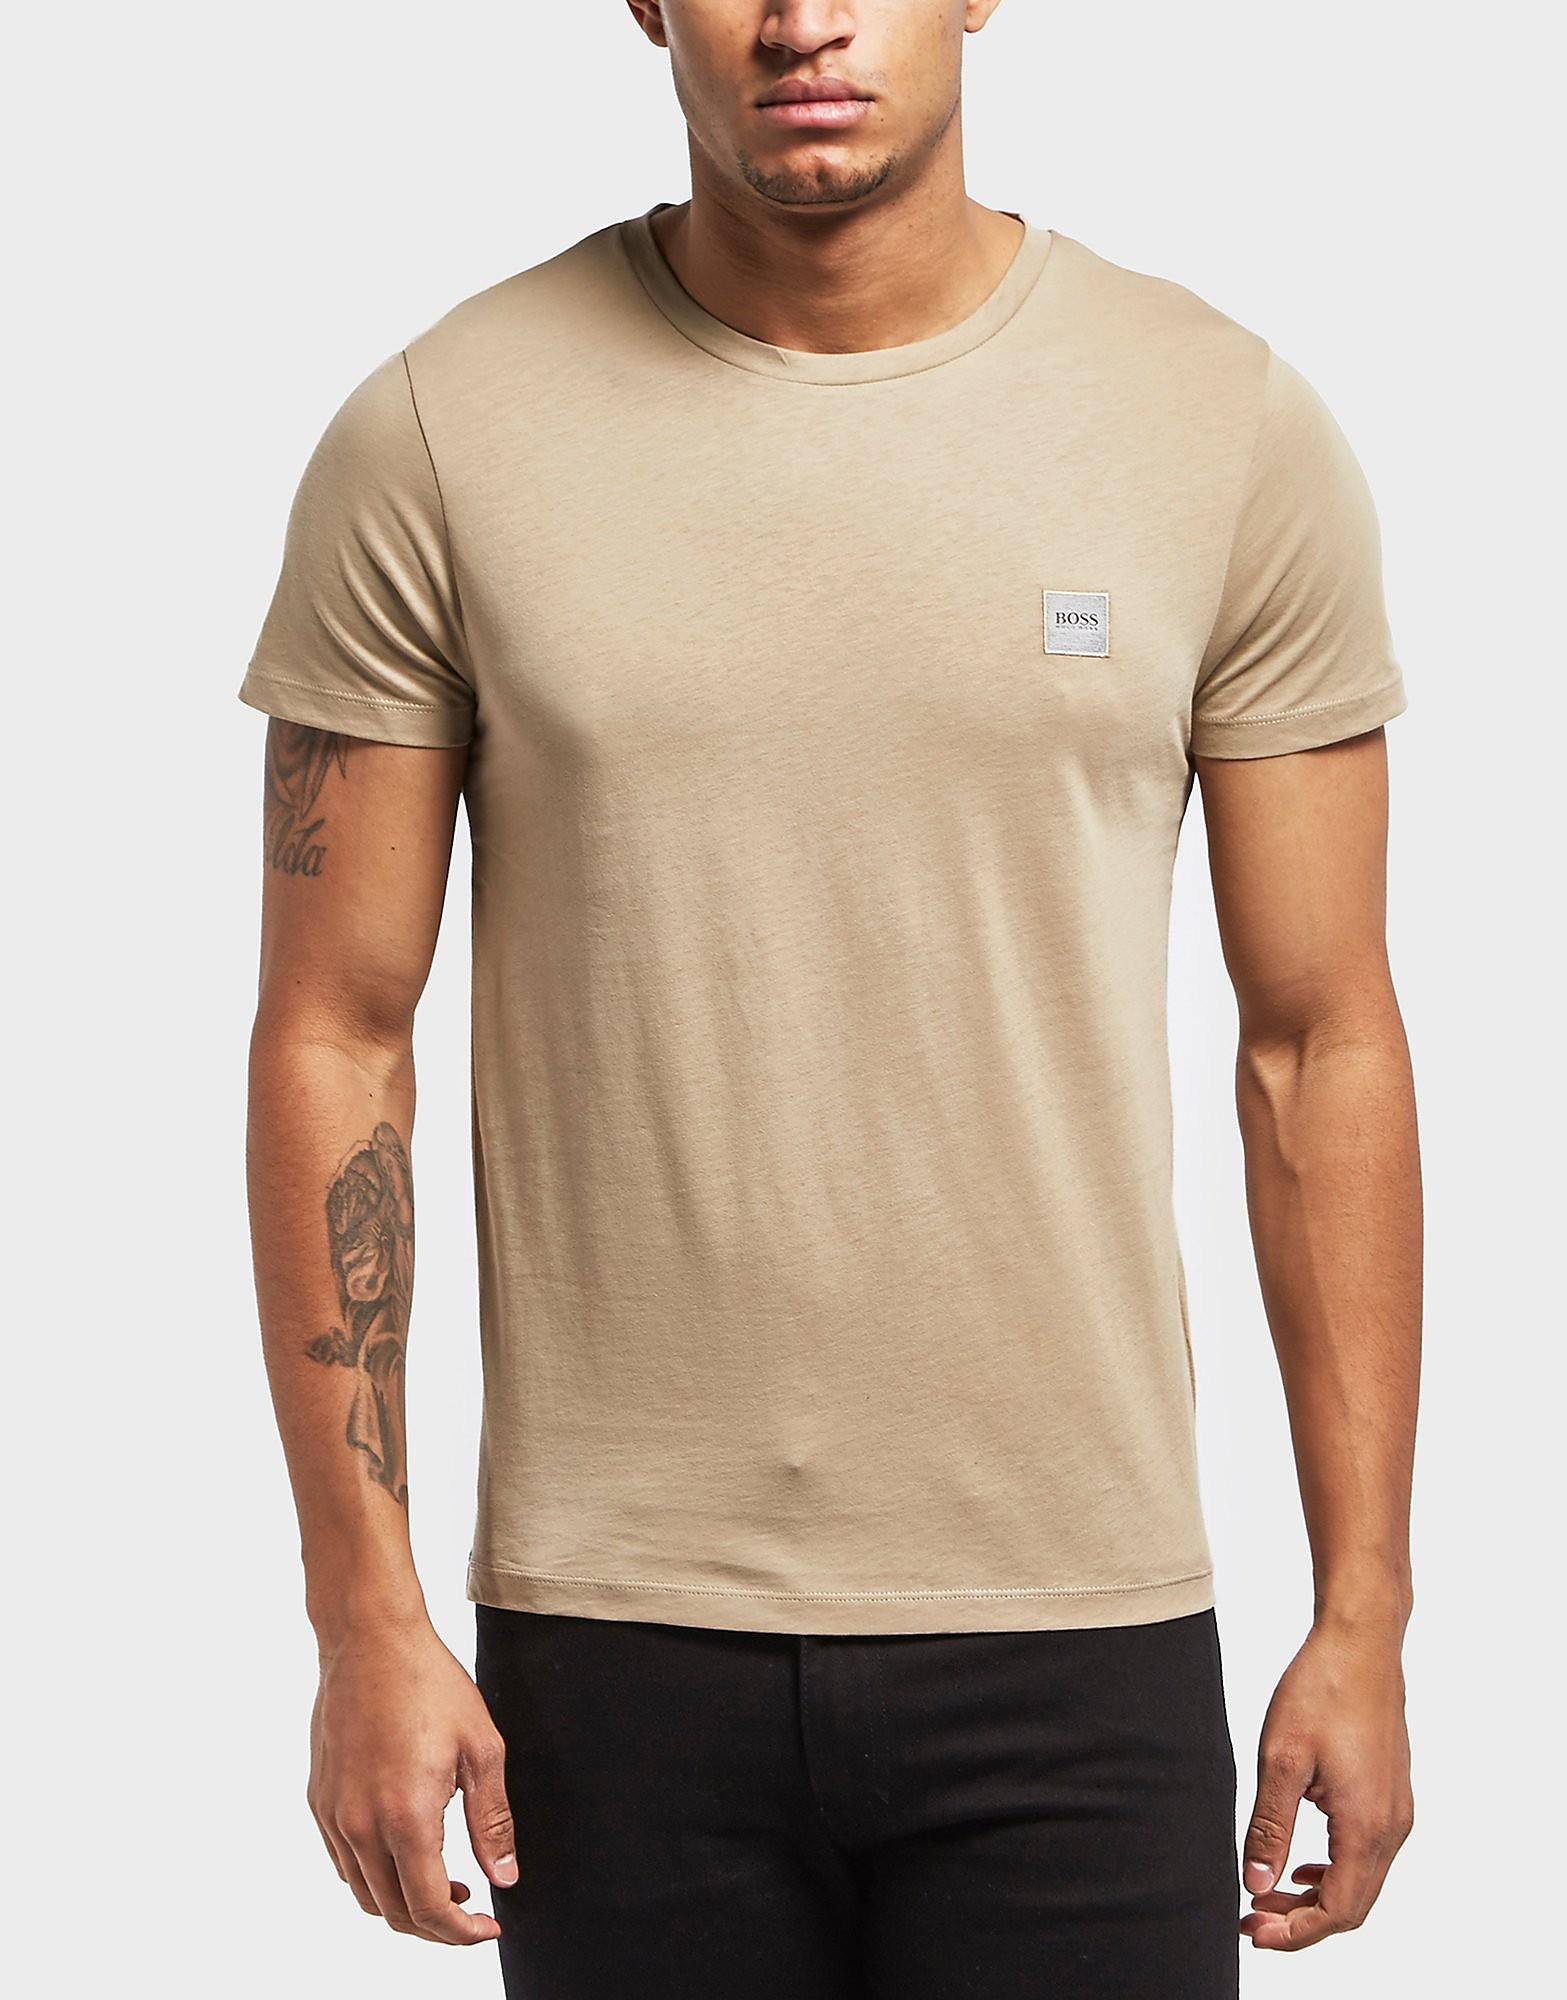 BOSS Orange Tommi Short Sleeve T-Shirt